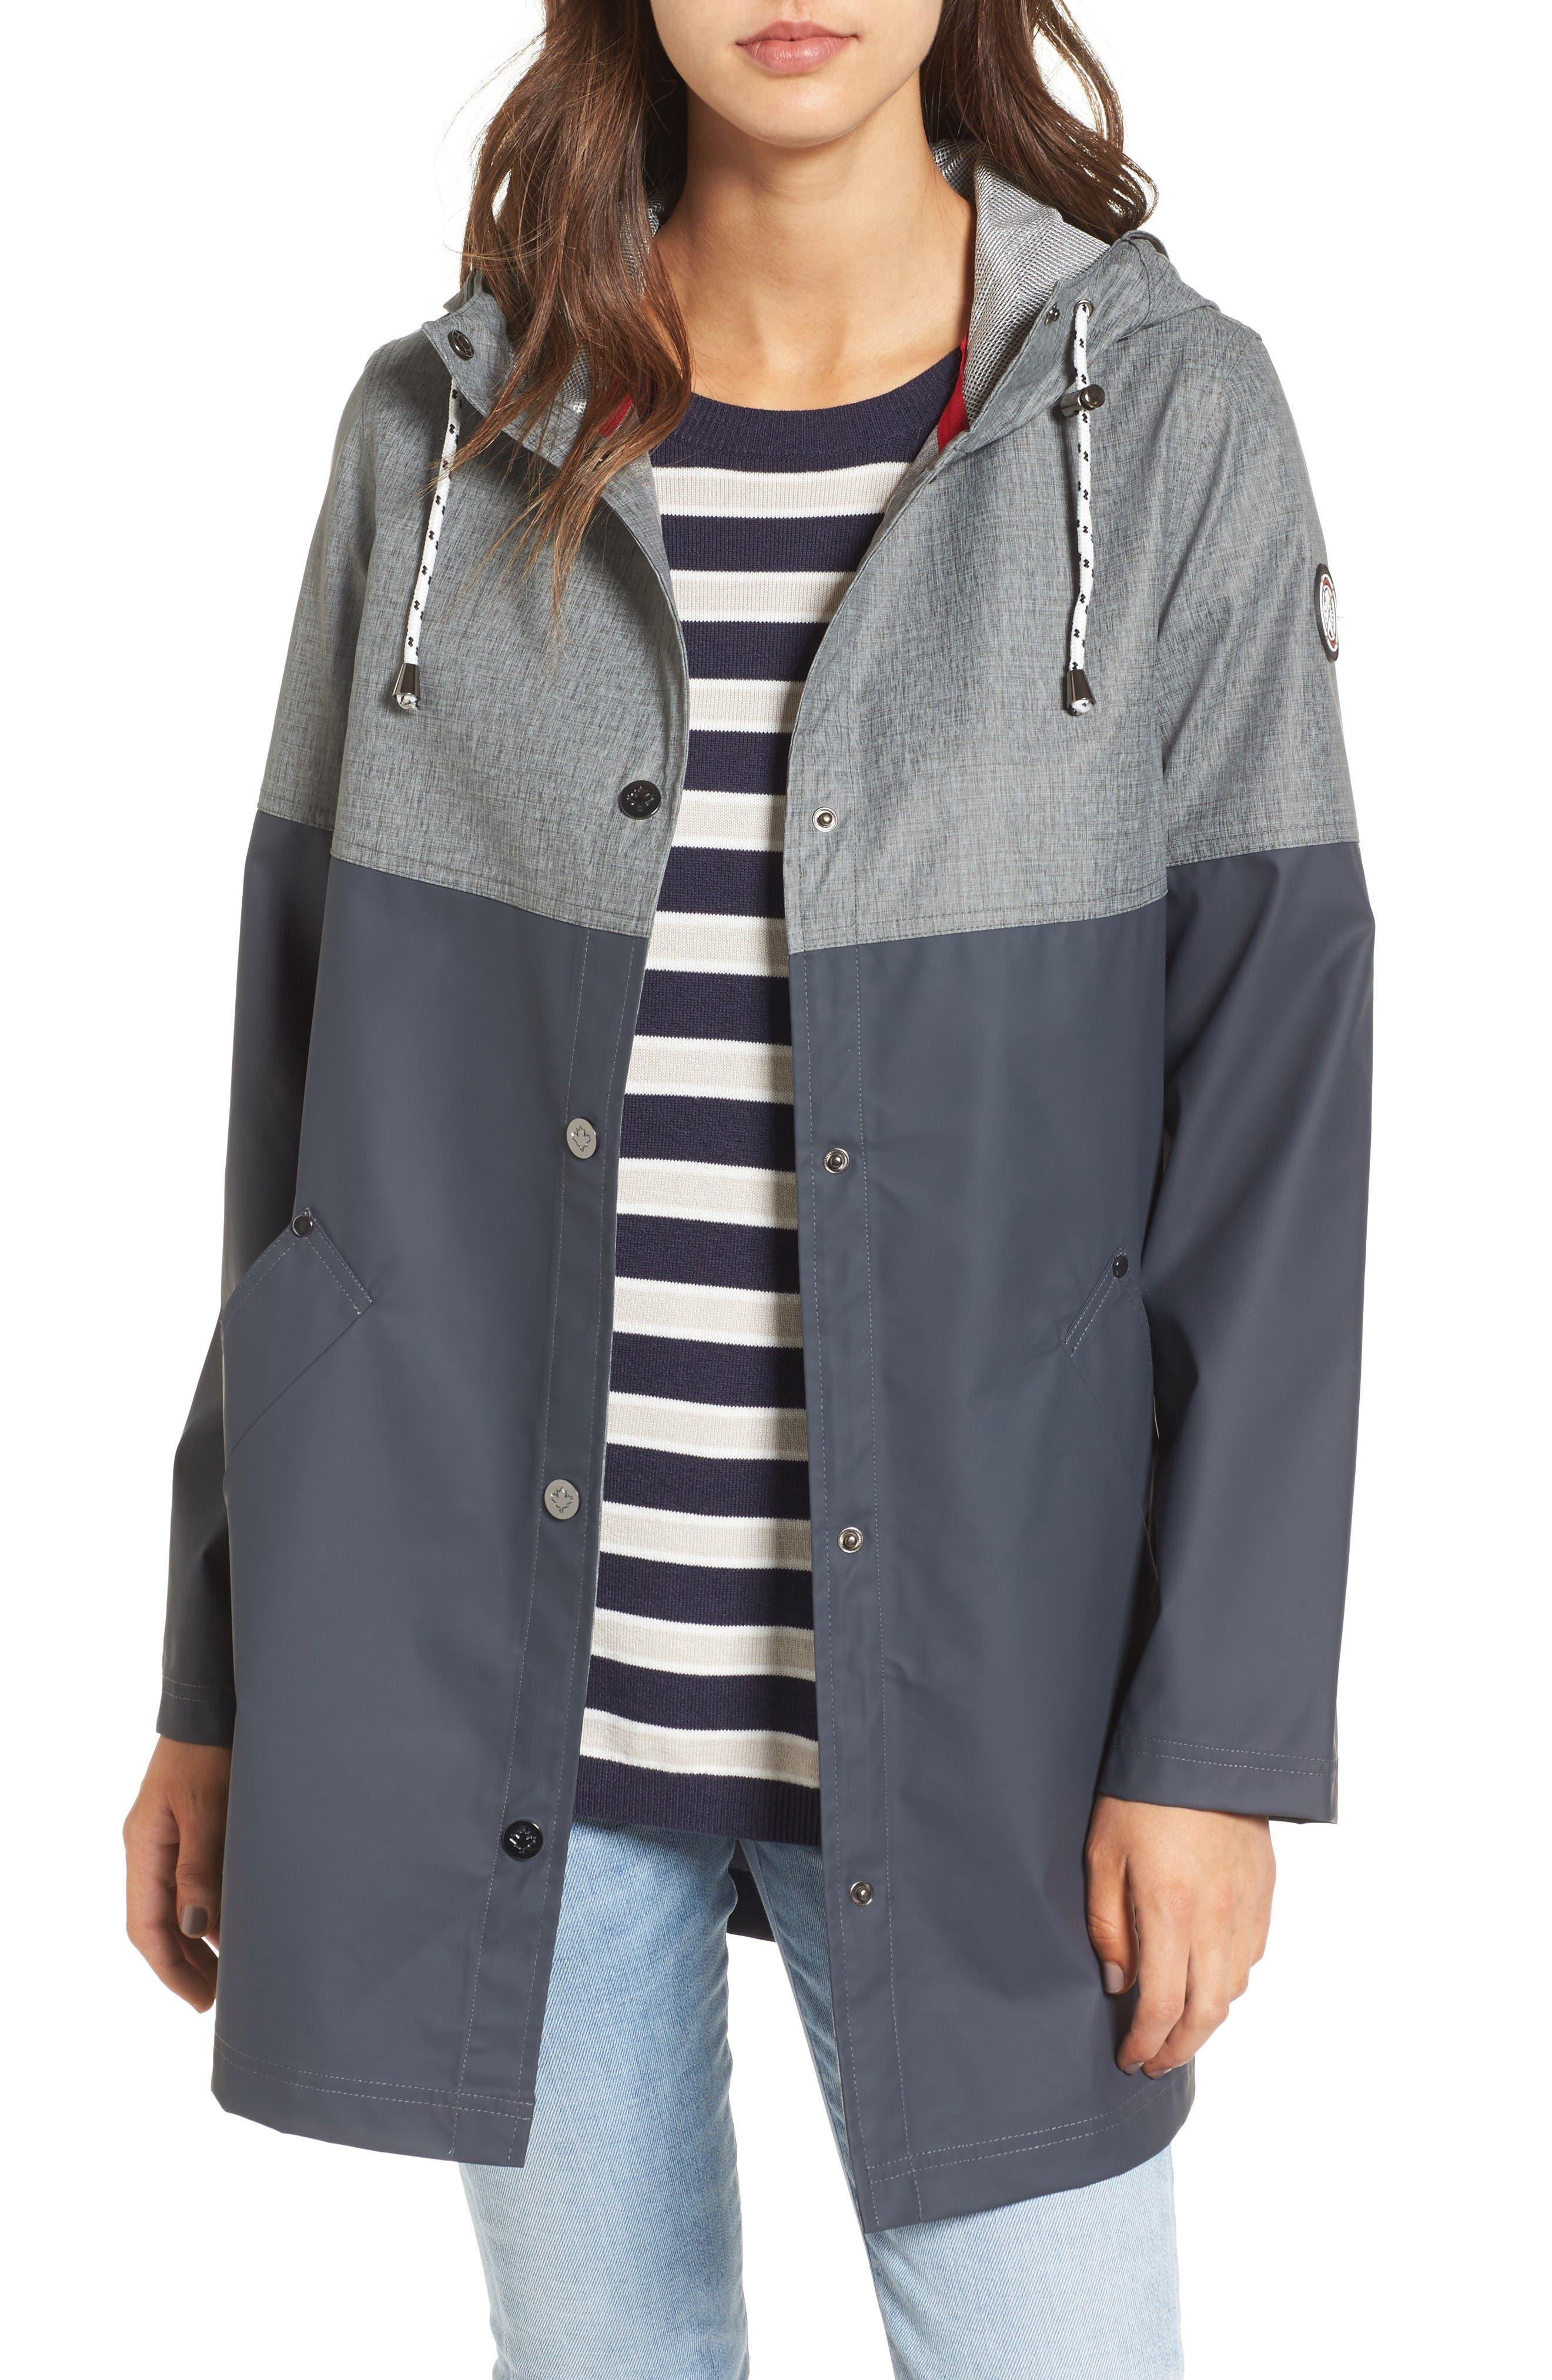 Alternate Image 1 Selected - Halifax Colorblock Rain Jacket